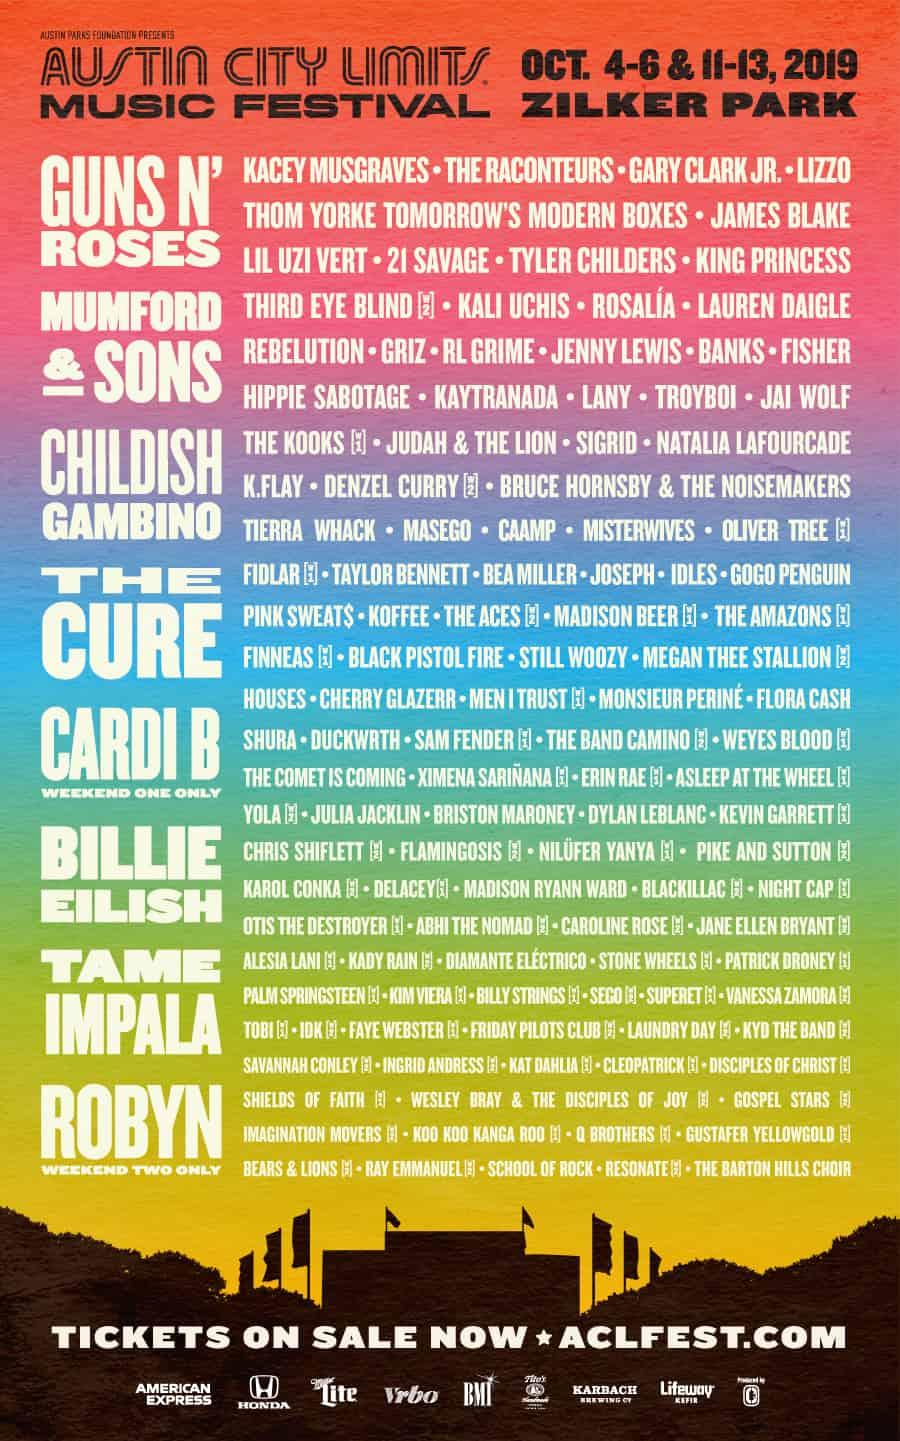 Guns N' Roses Lead (ACL) Austin City Limits Fest Lineup